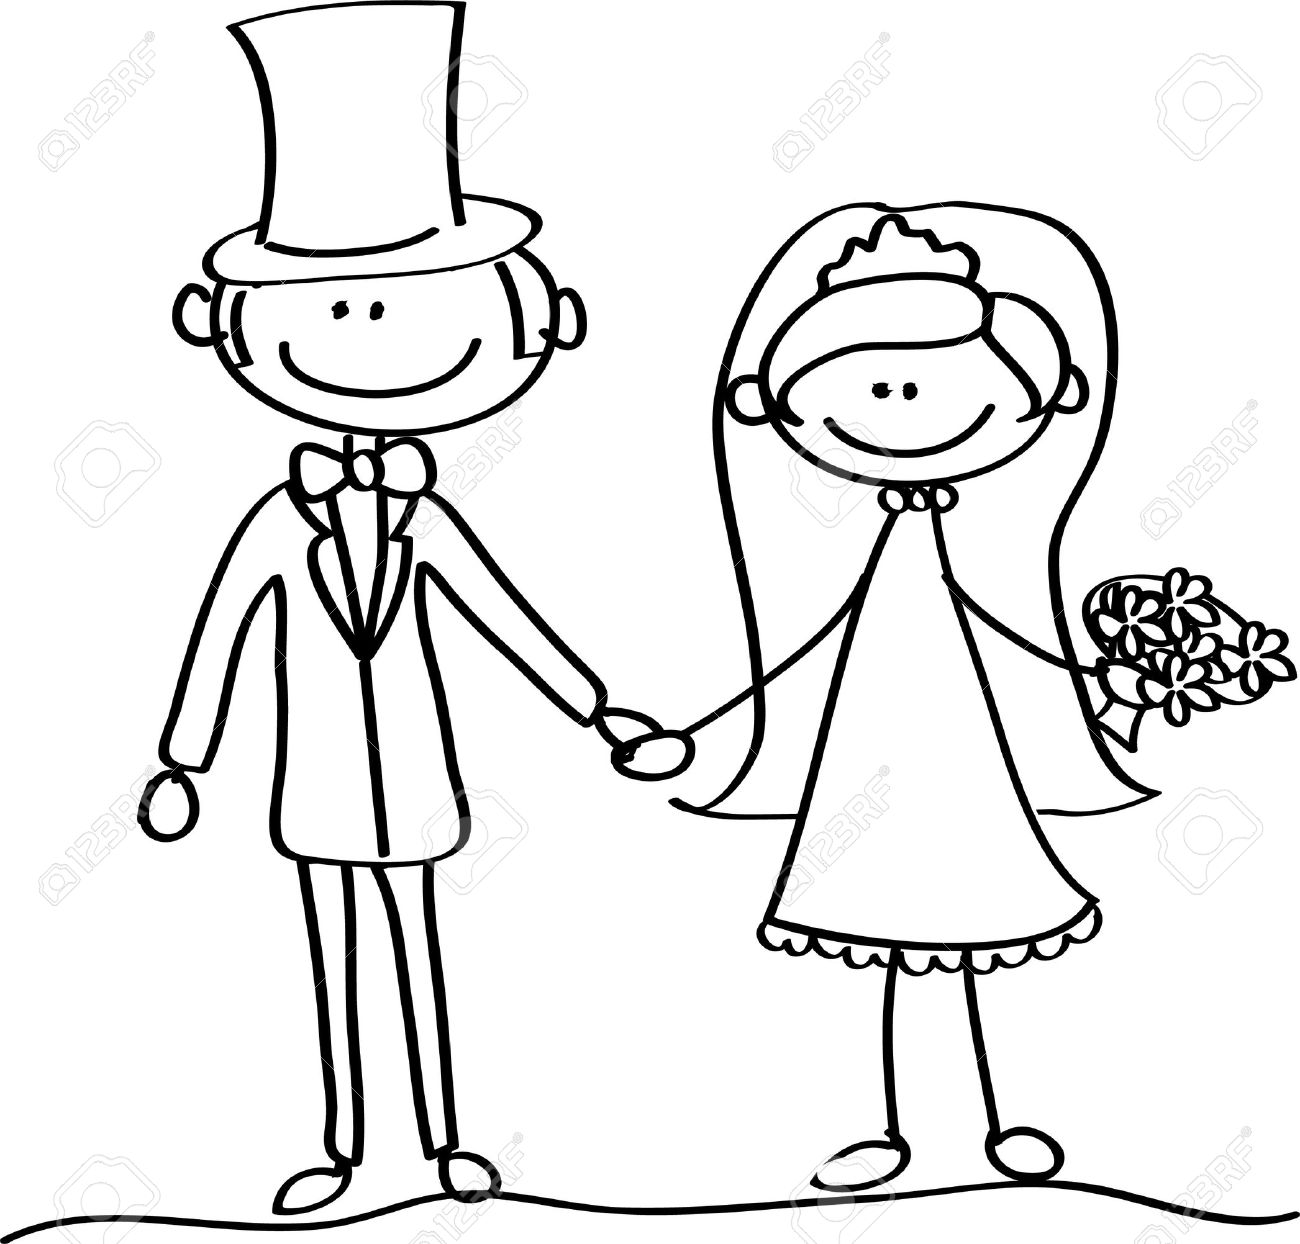 Groom And Bride Drawing At Getdrawings